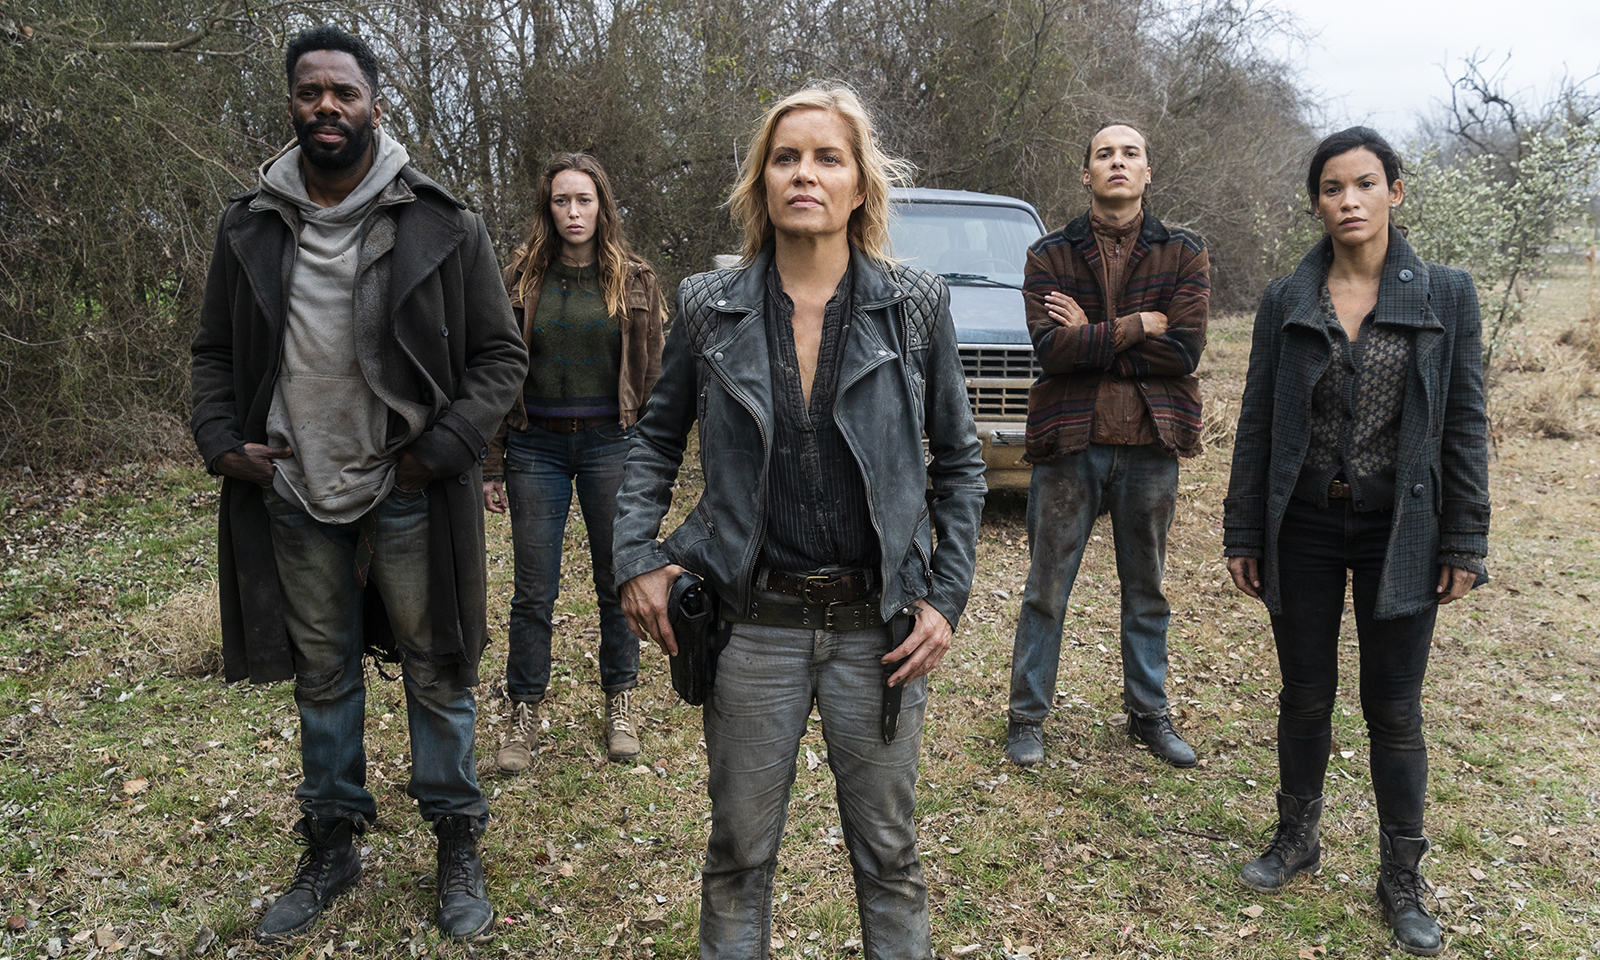 victor, alicia, madison, nick e luciana na estrada em cena da 4ª temporada de Fear the Walking Dead